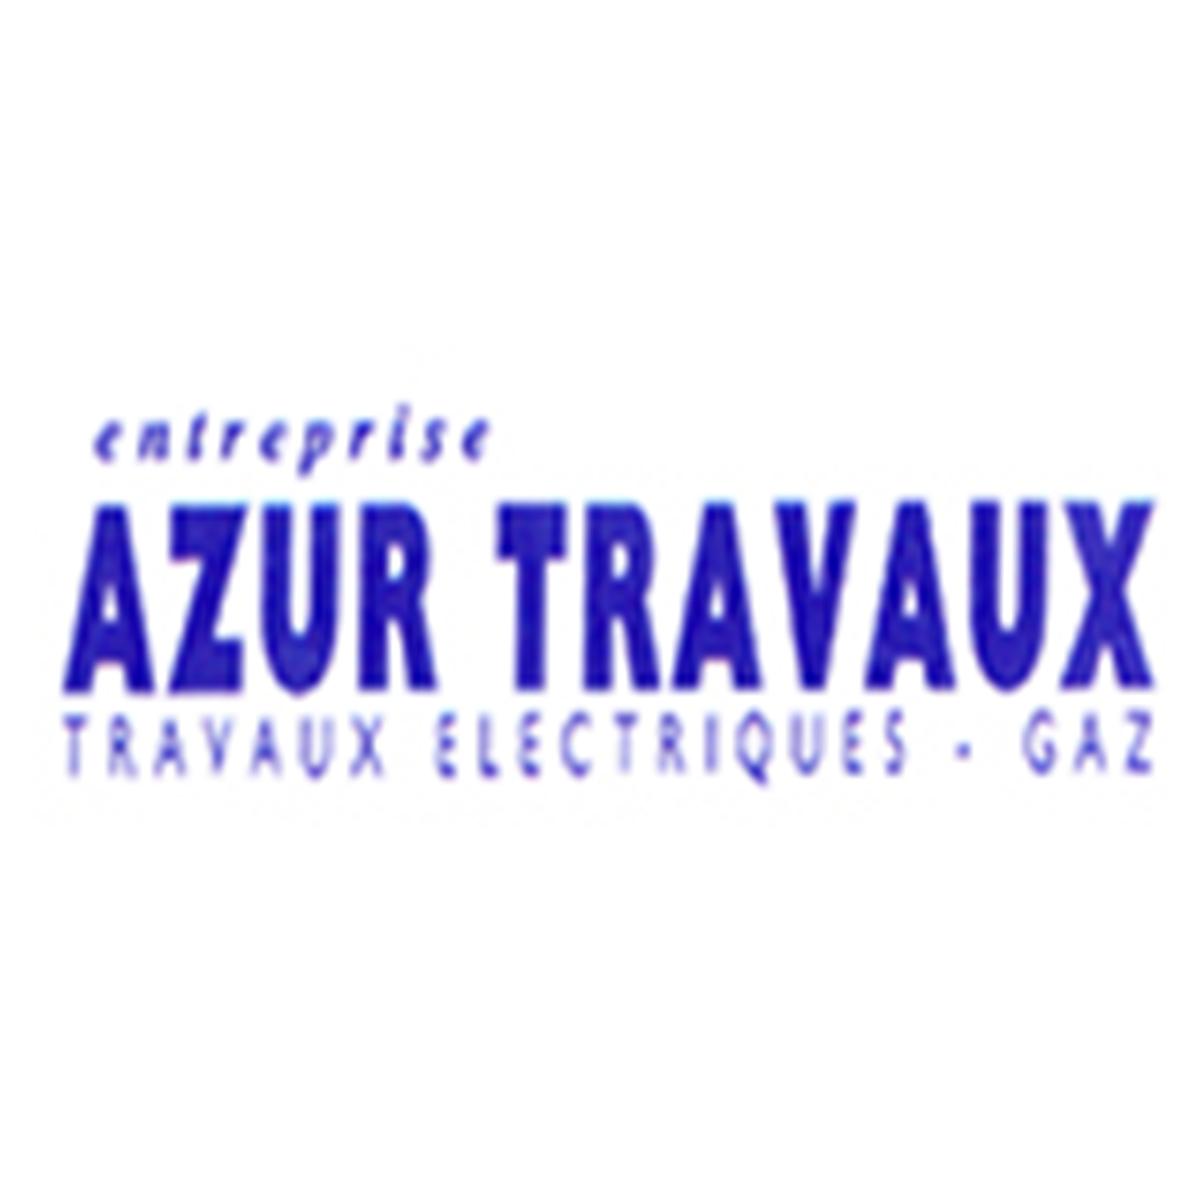 Azur Travaux